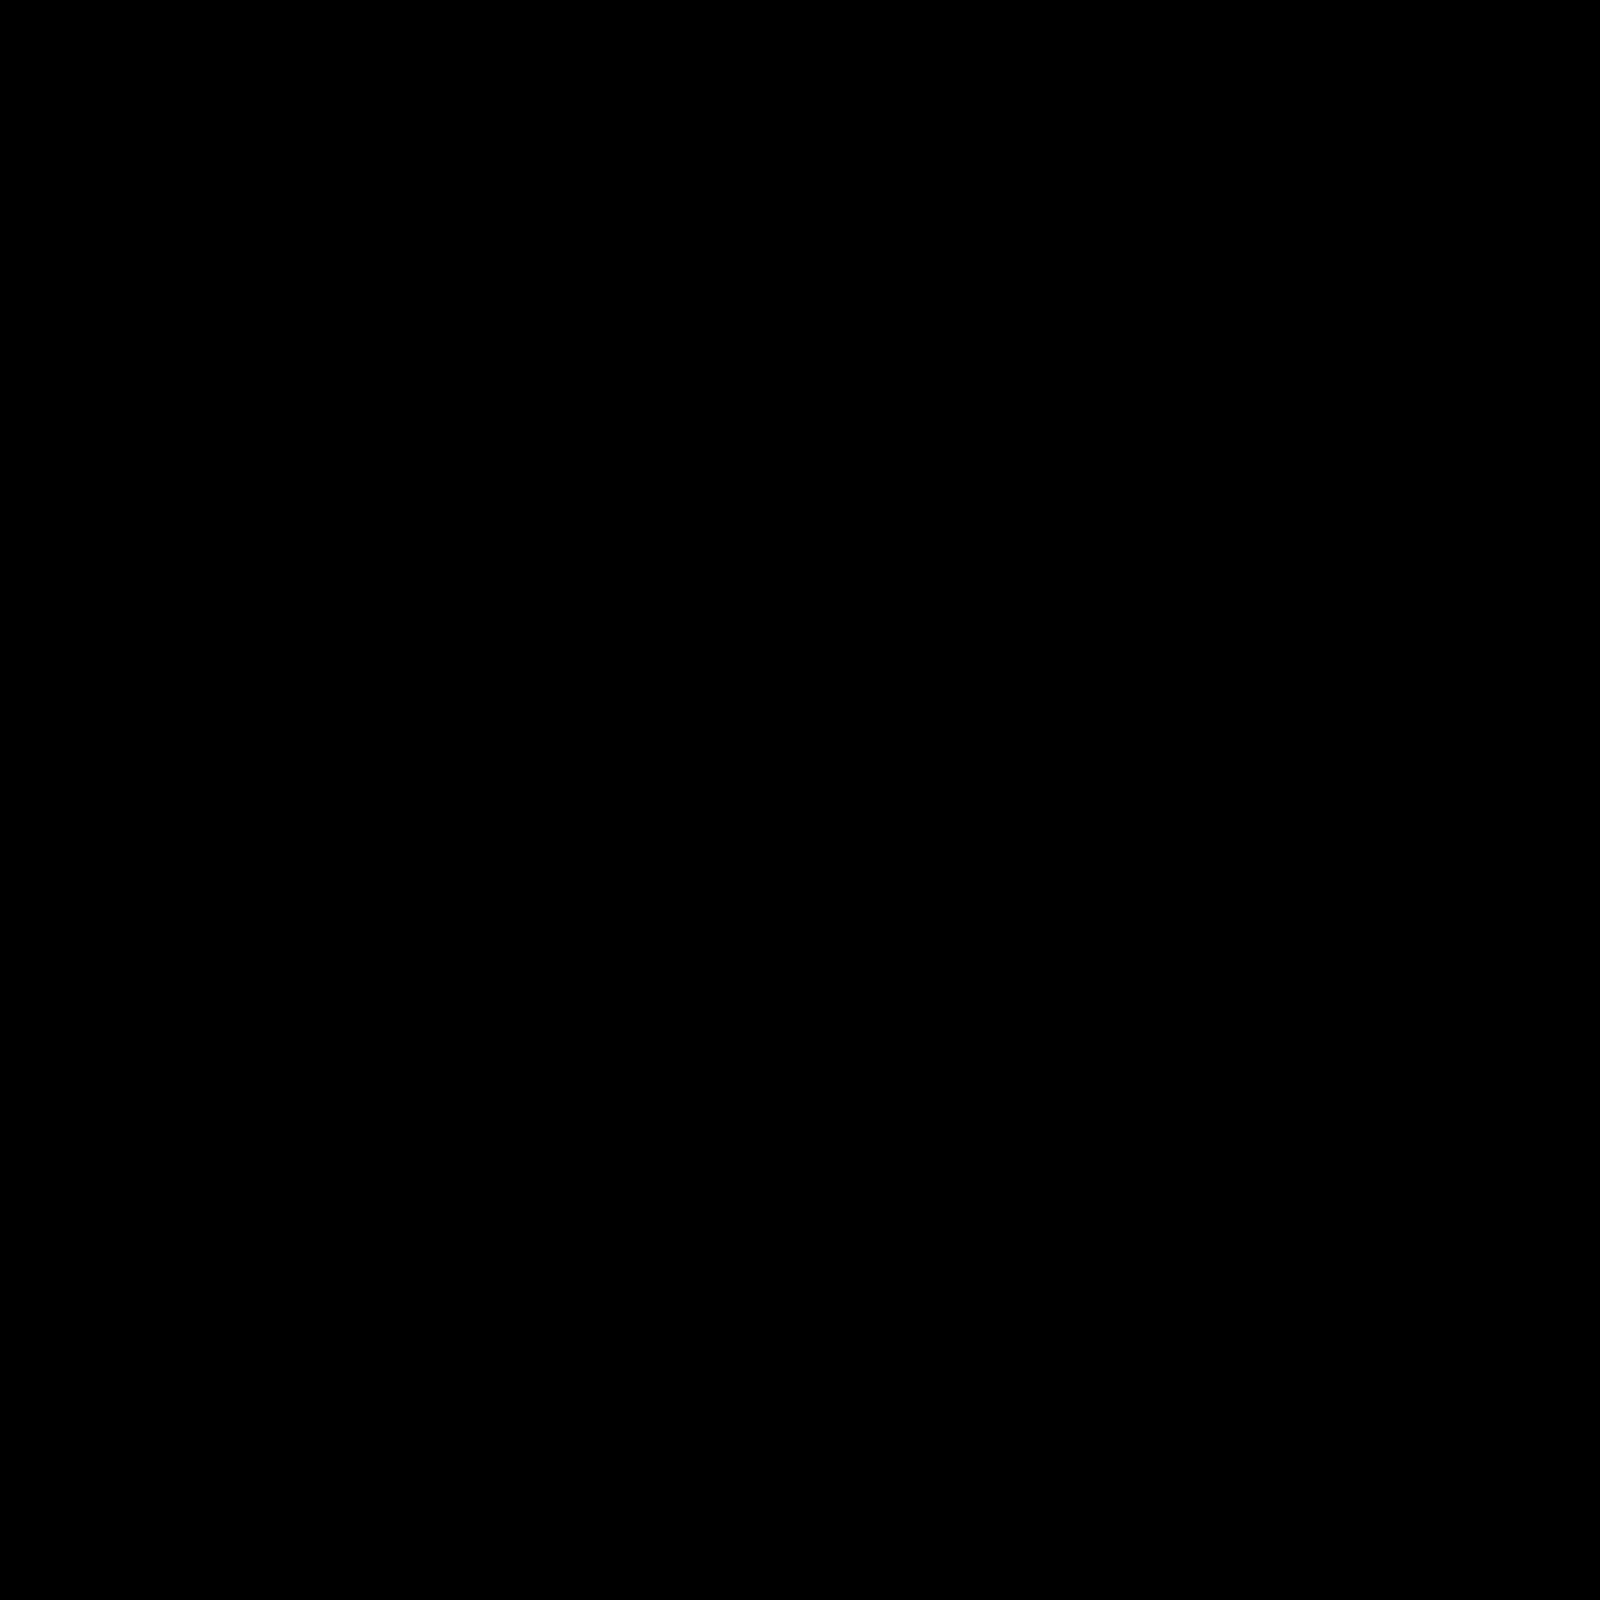 Label Printer Filled icon